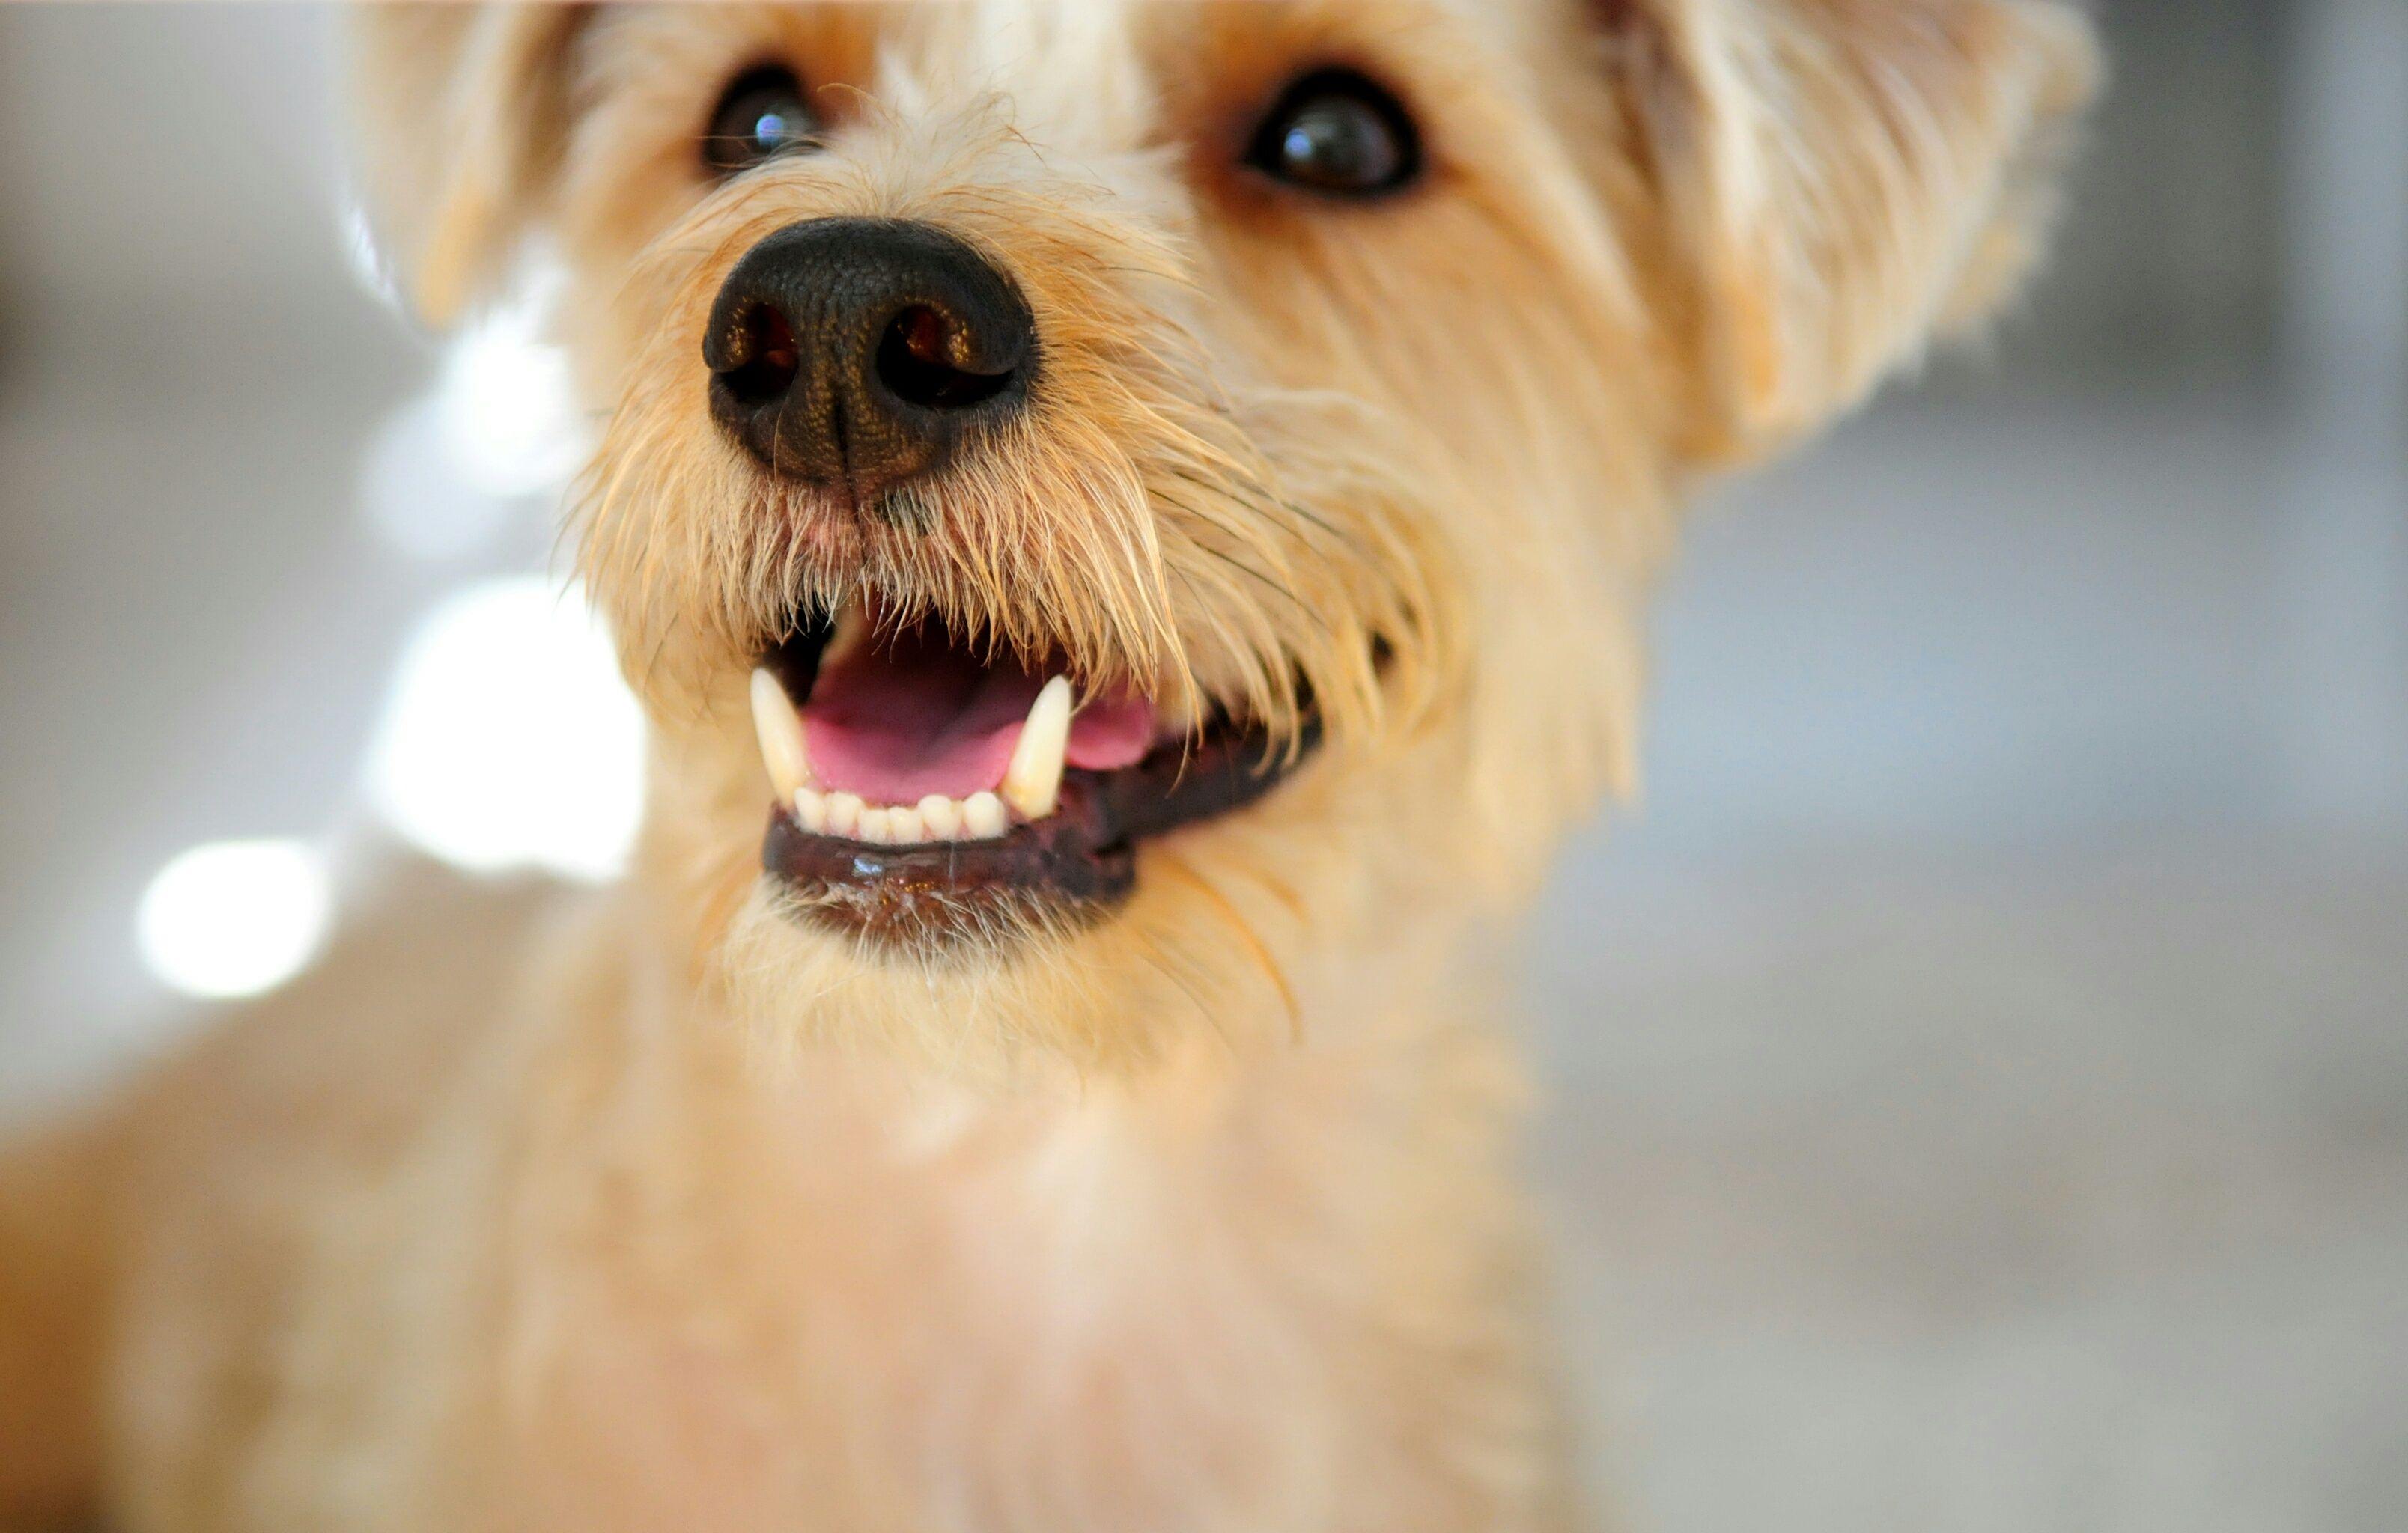 terrier-teeth-57b7513b5f9b58cdfdce82b6.jpg